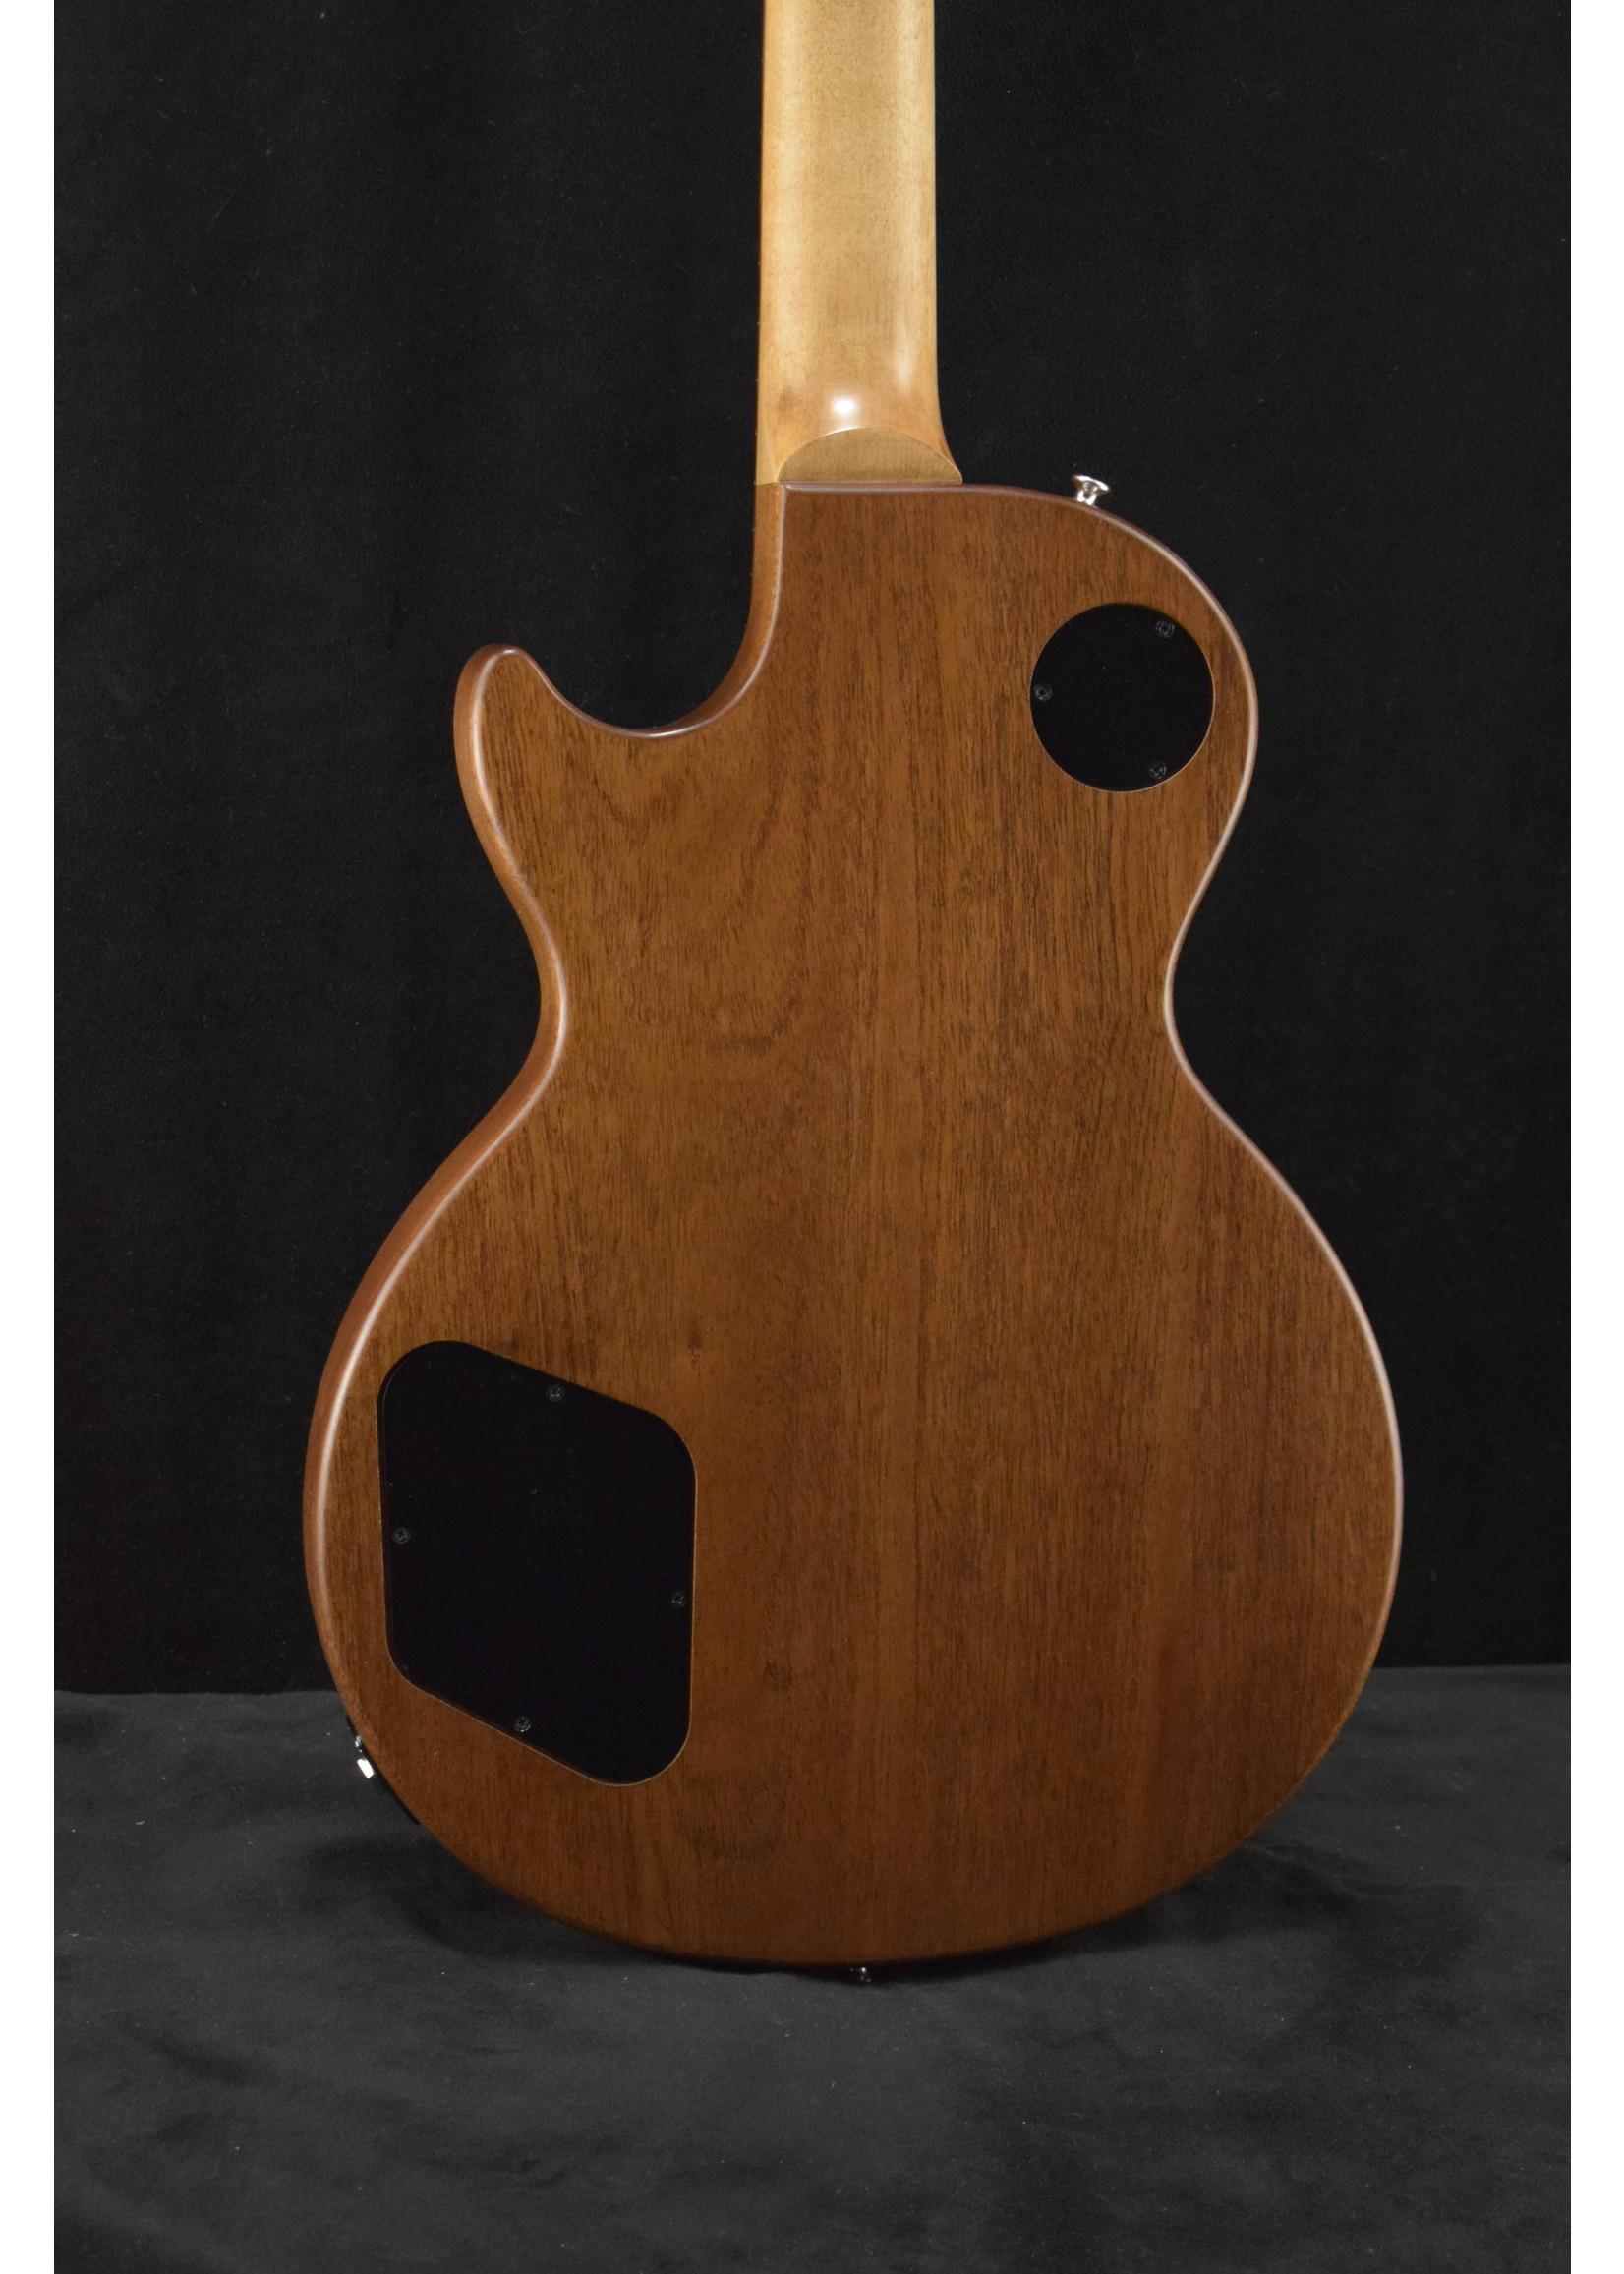 Gibson Gibson Les Paul Special Tribute Humbucker Natural Walnut Satin